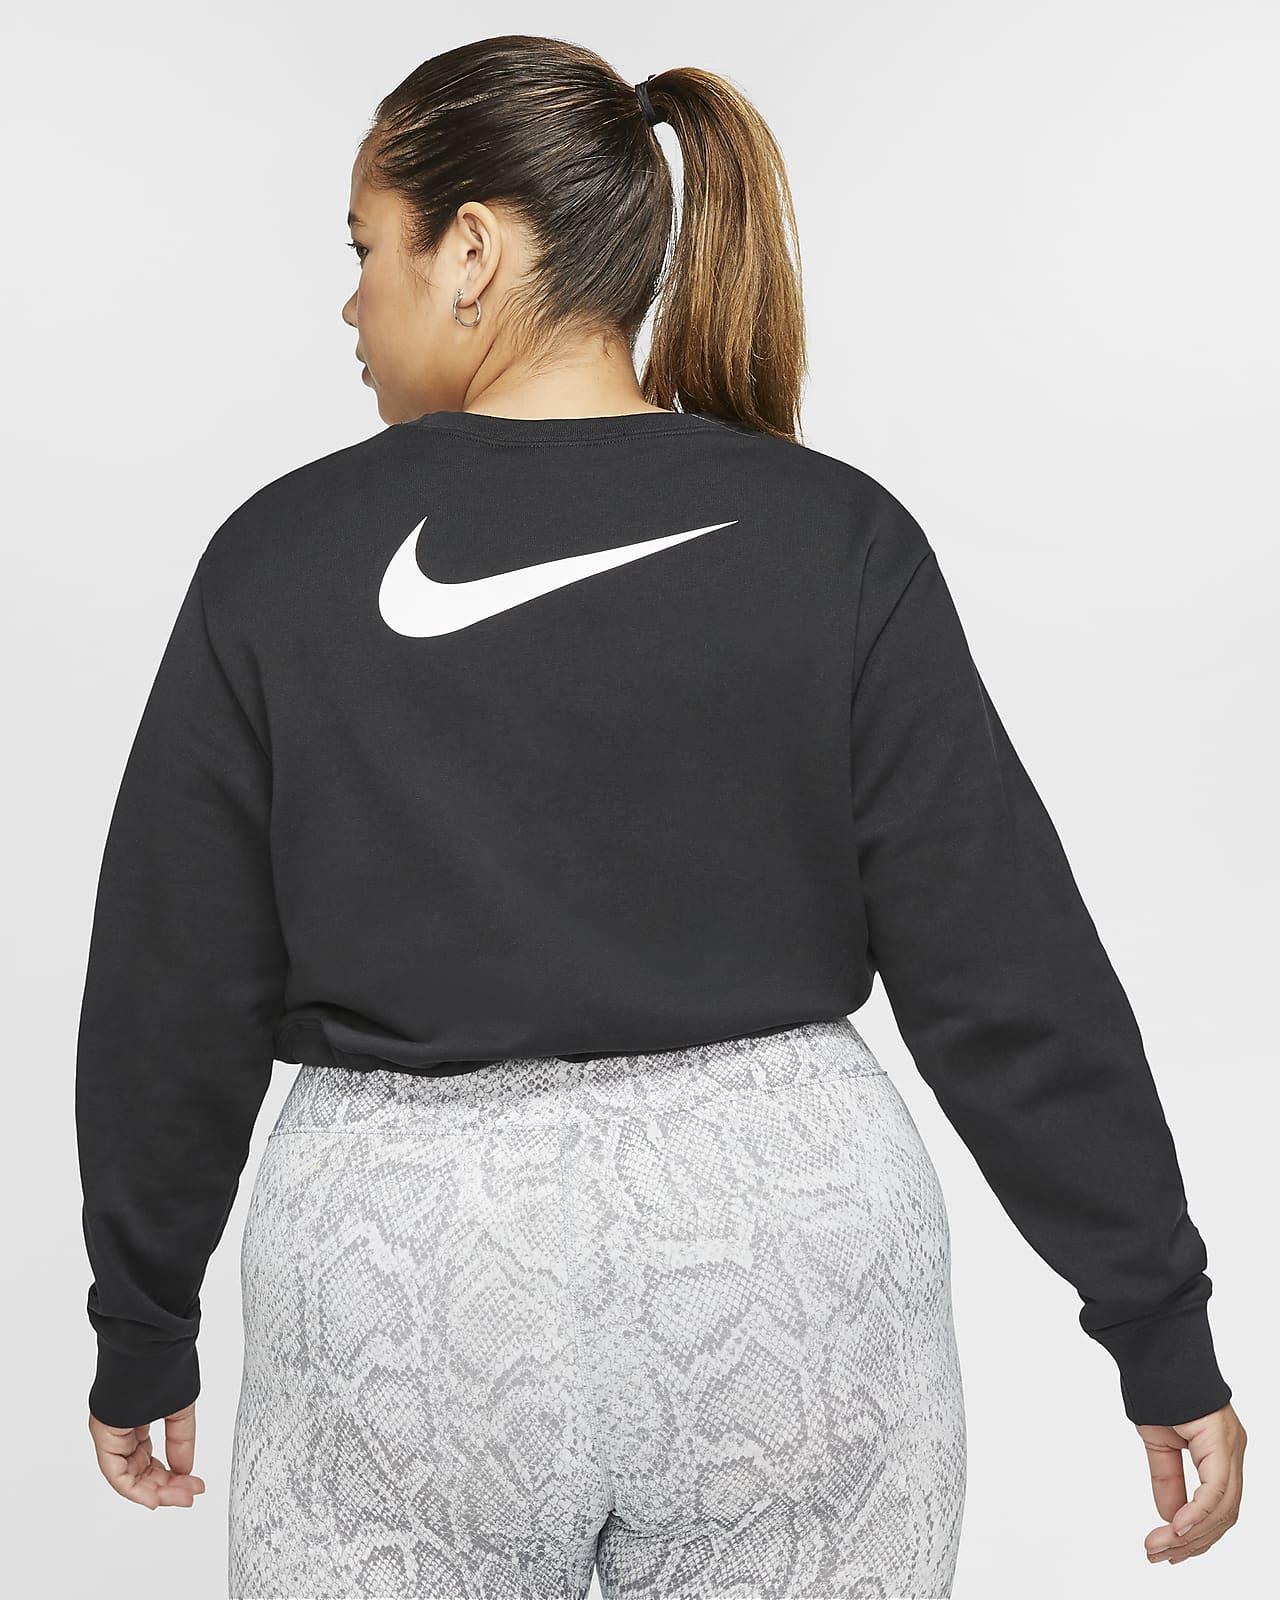 Nike Sportswear Swoosh Women's French Terry Crew. Nike NL